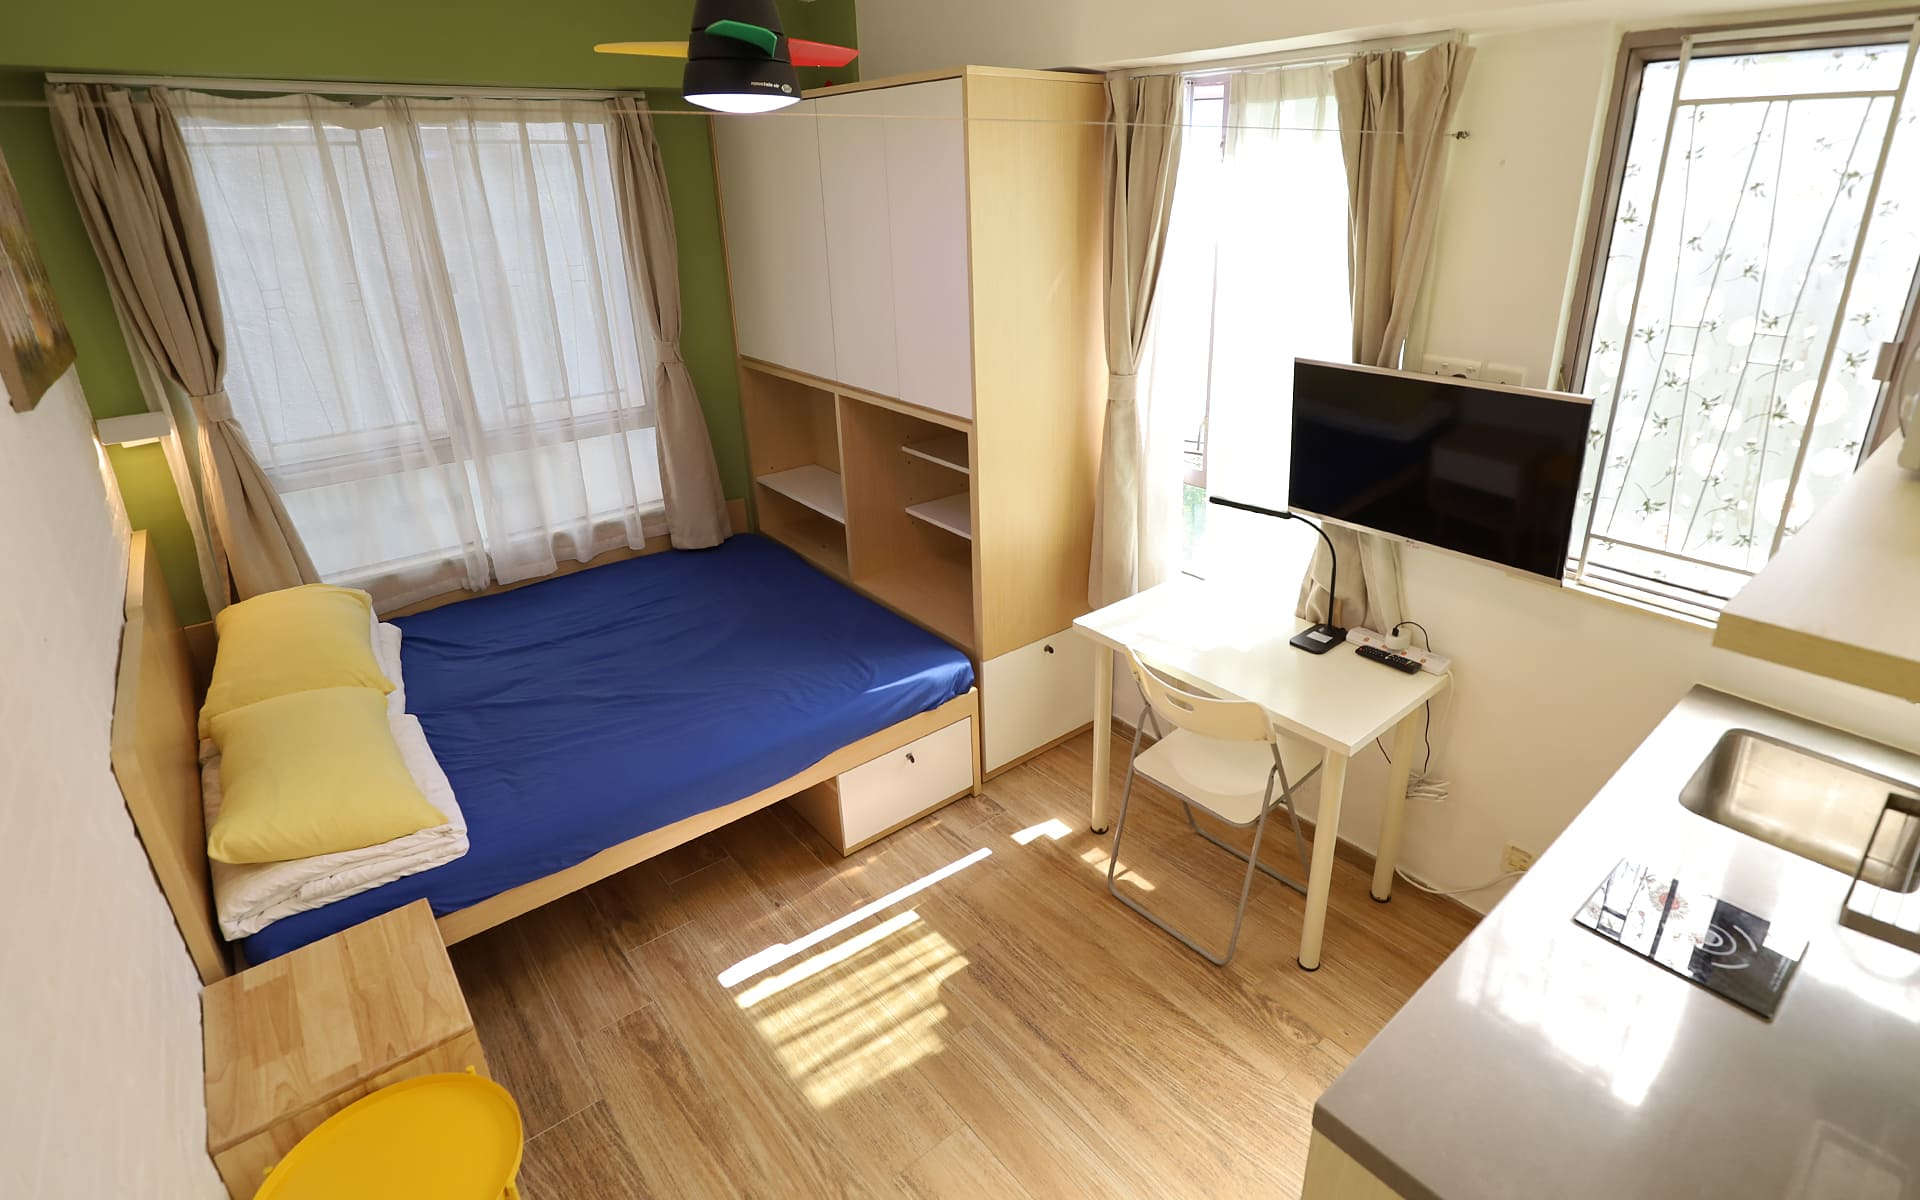 hk_service_apartment_17047281321613534263.jpg